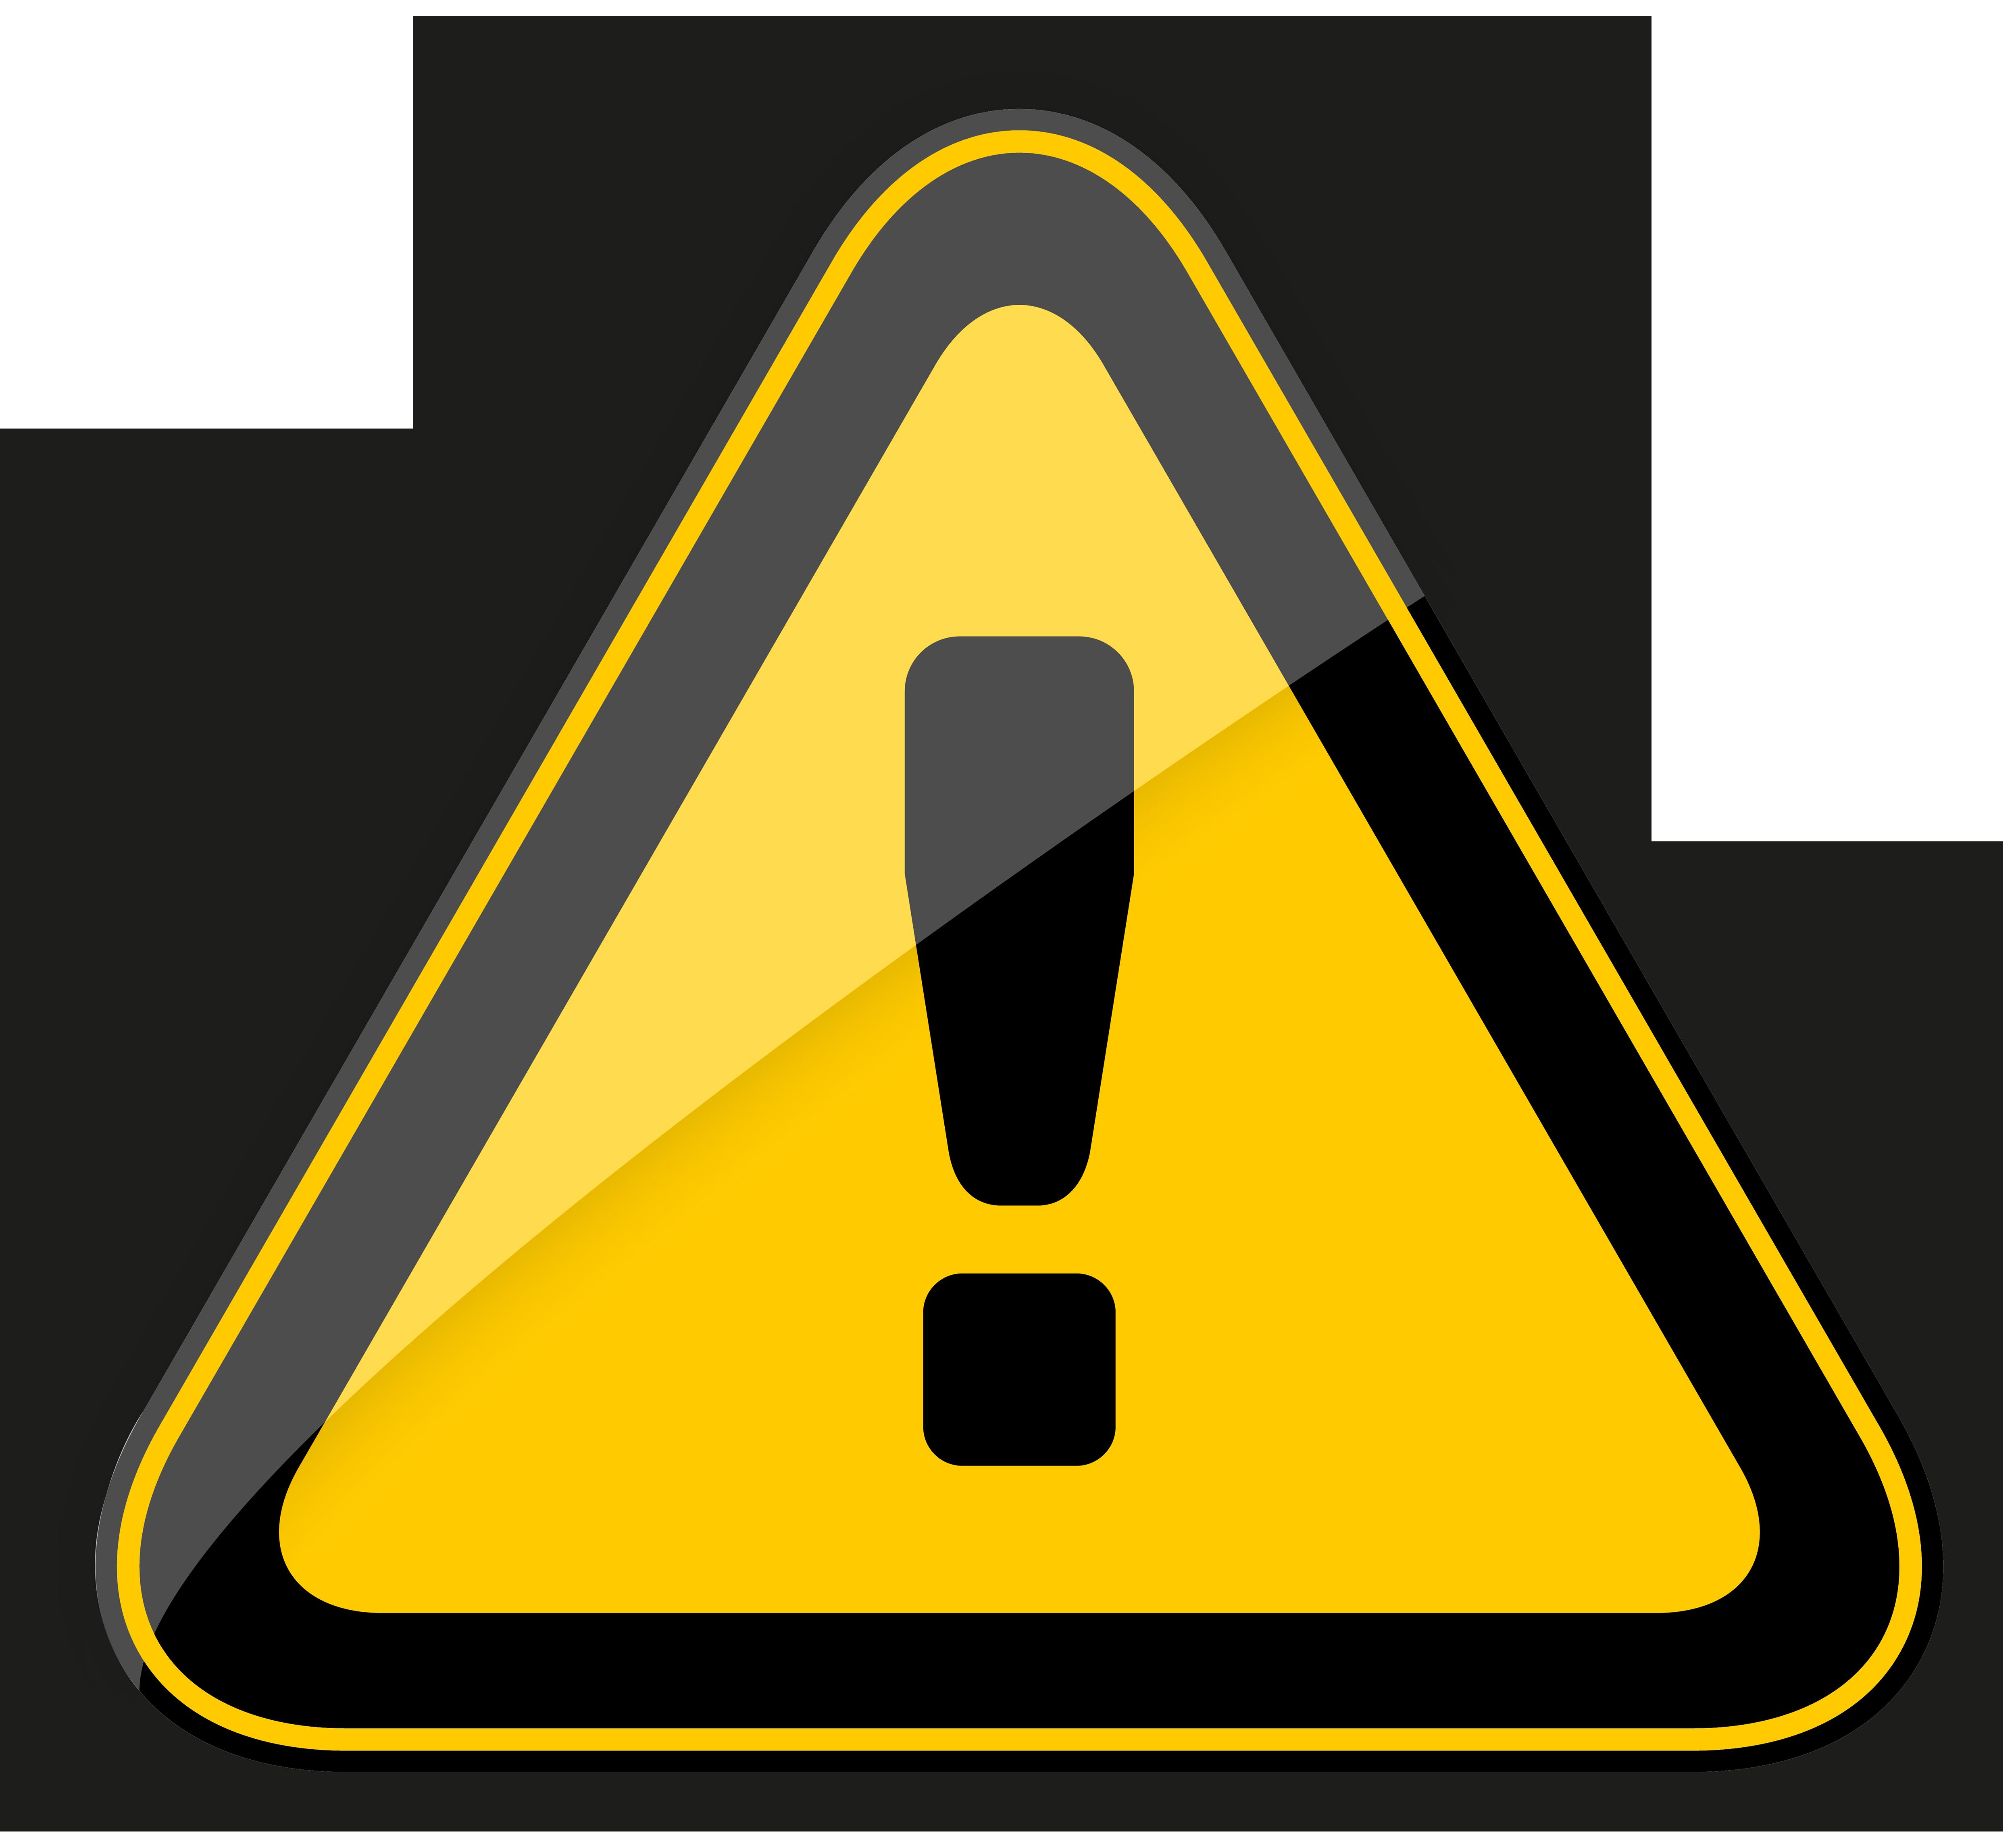 png transparent stock Warning sign png best. Danger clipart.